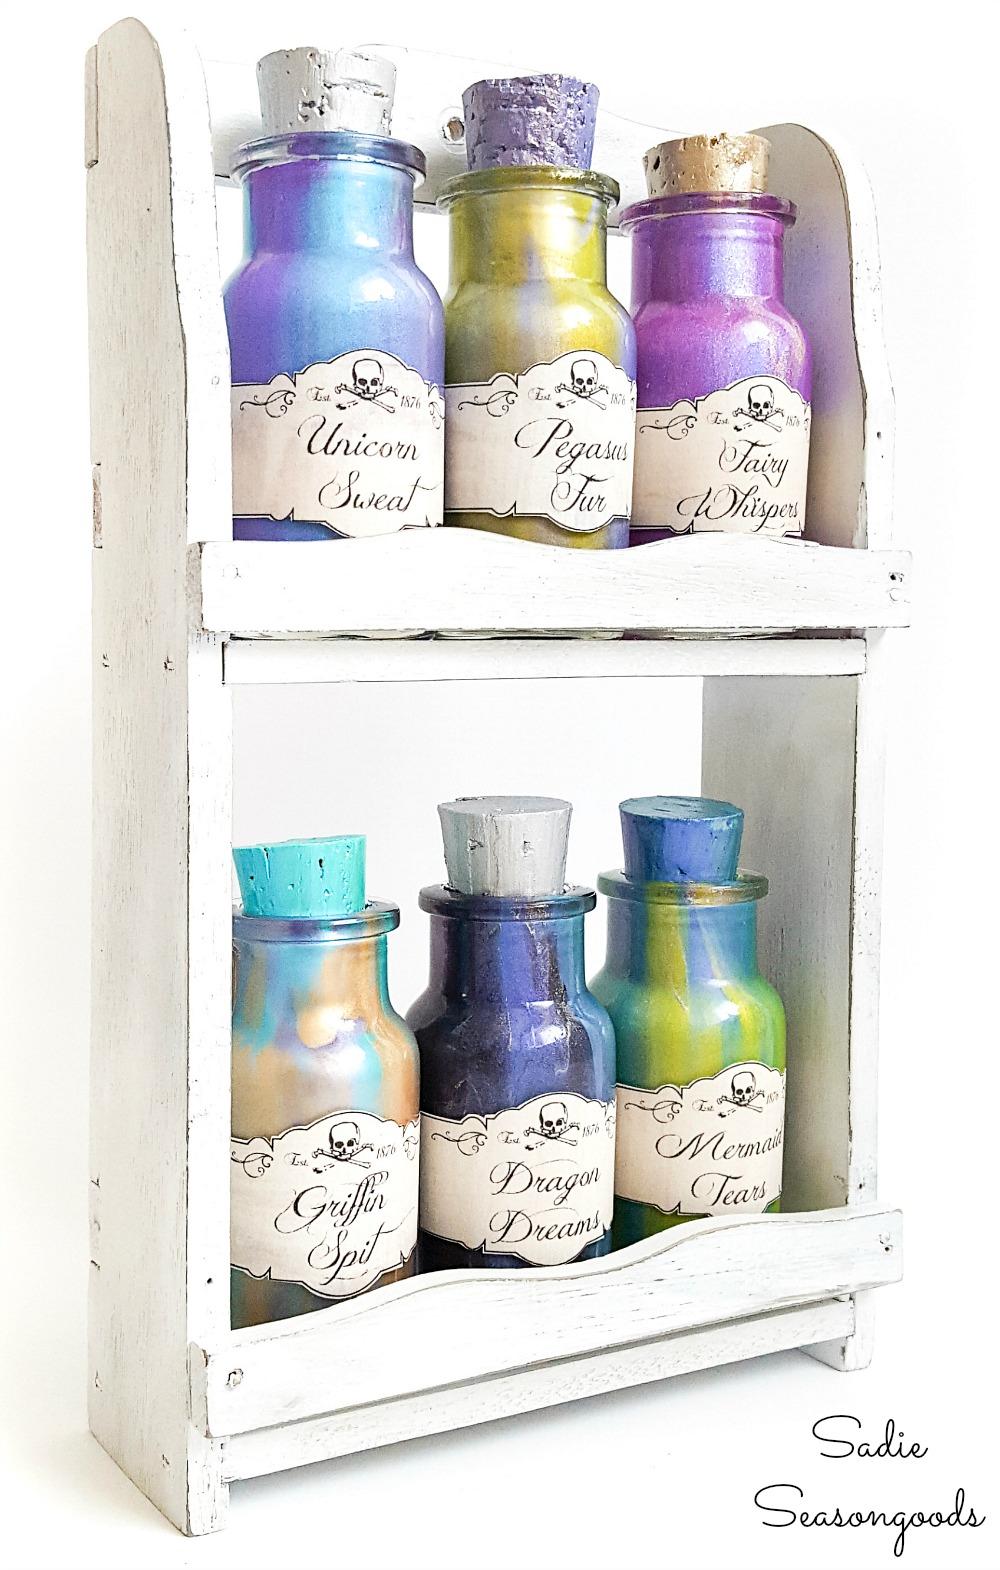 Repurposing an old spice rack as Halloween potion bottles